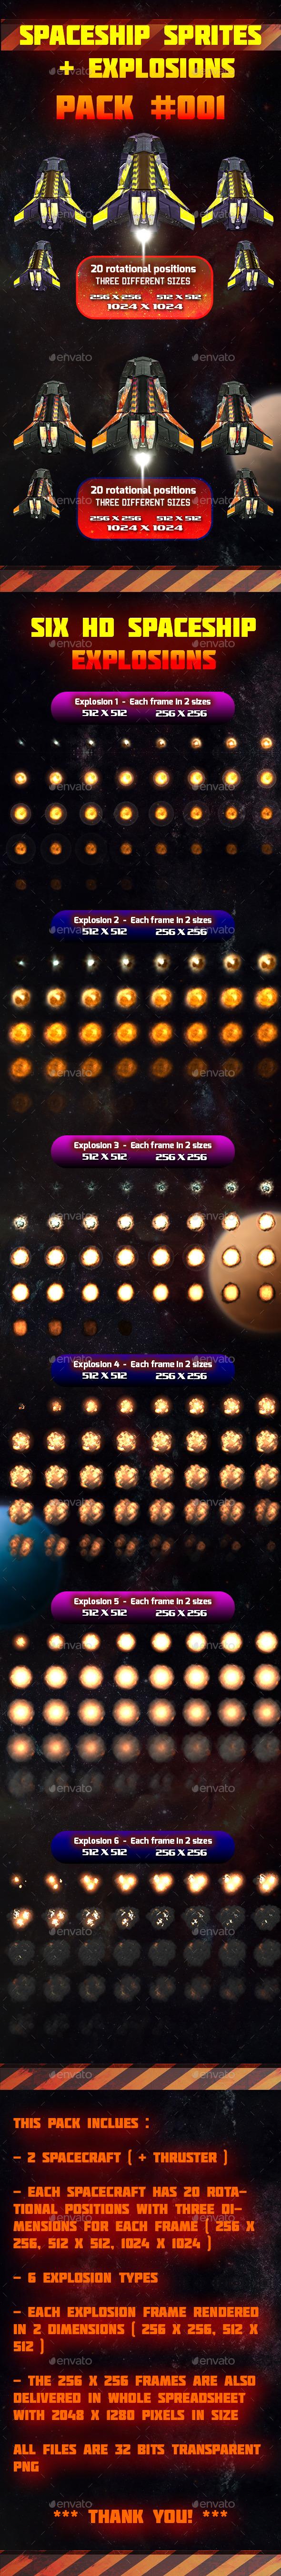 Spaceship Sprites and Explosions Pack 001 (Sprites)